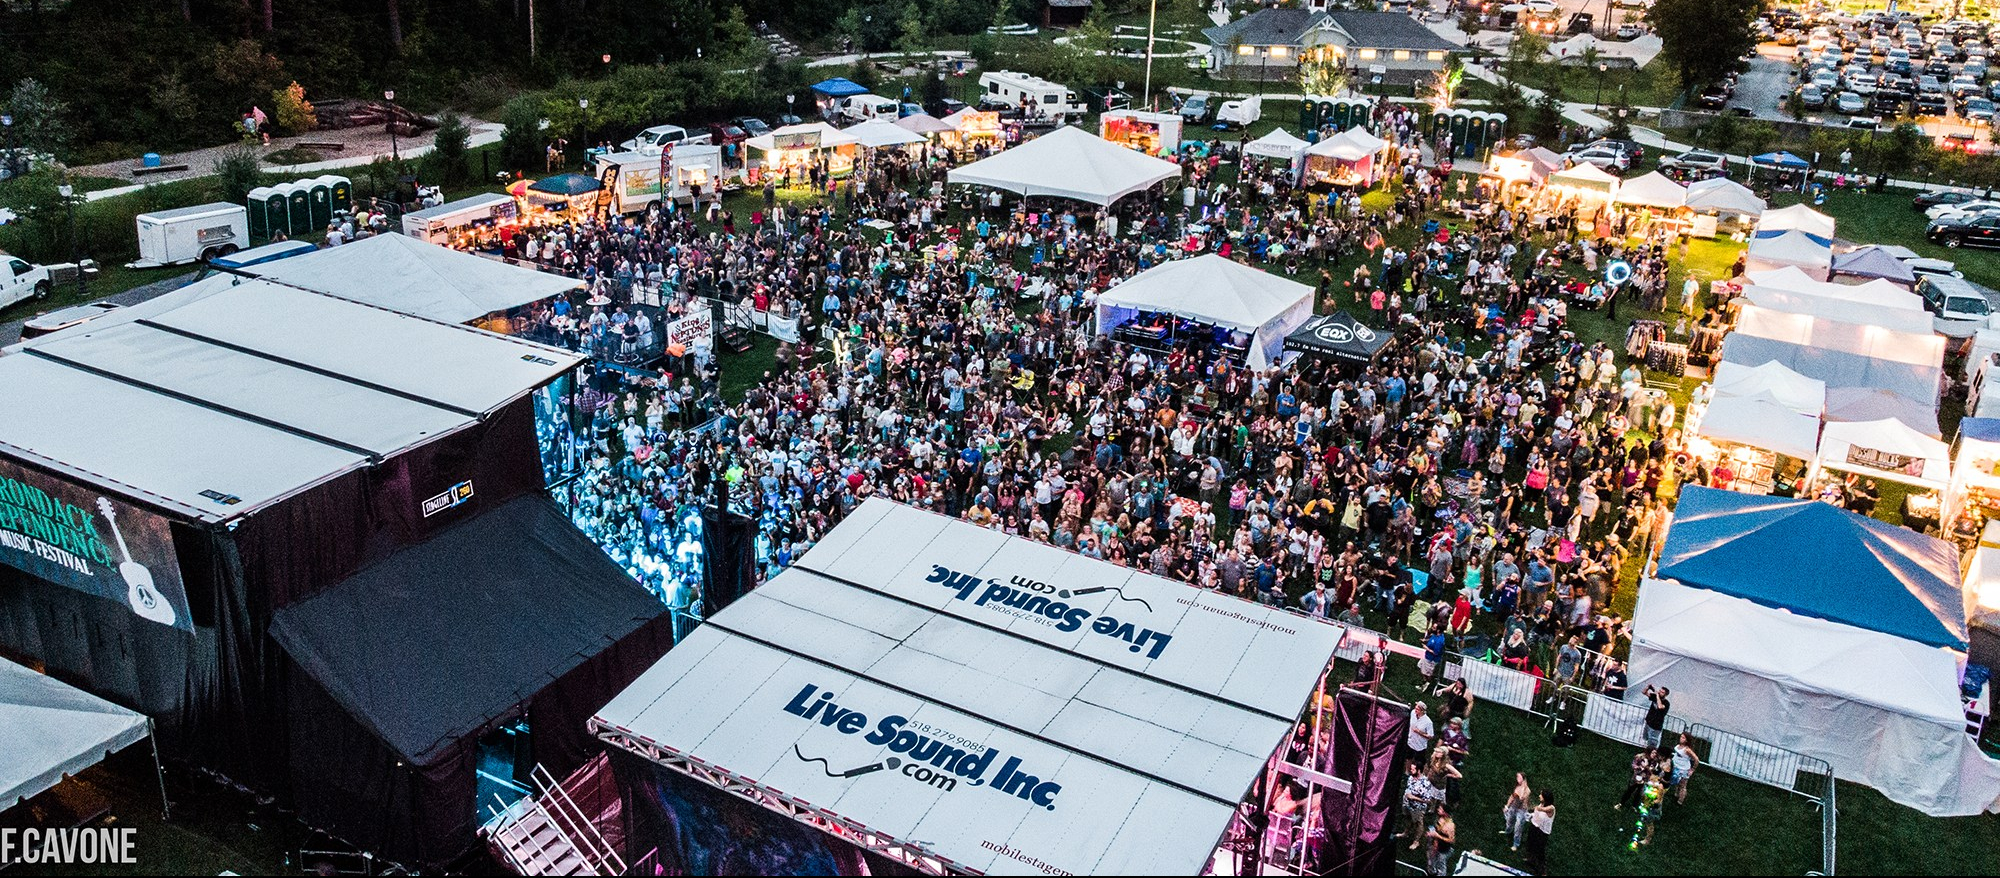 Adirondack Independence Music Festival Announces 2019 Dates